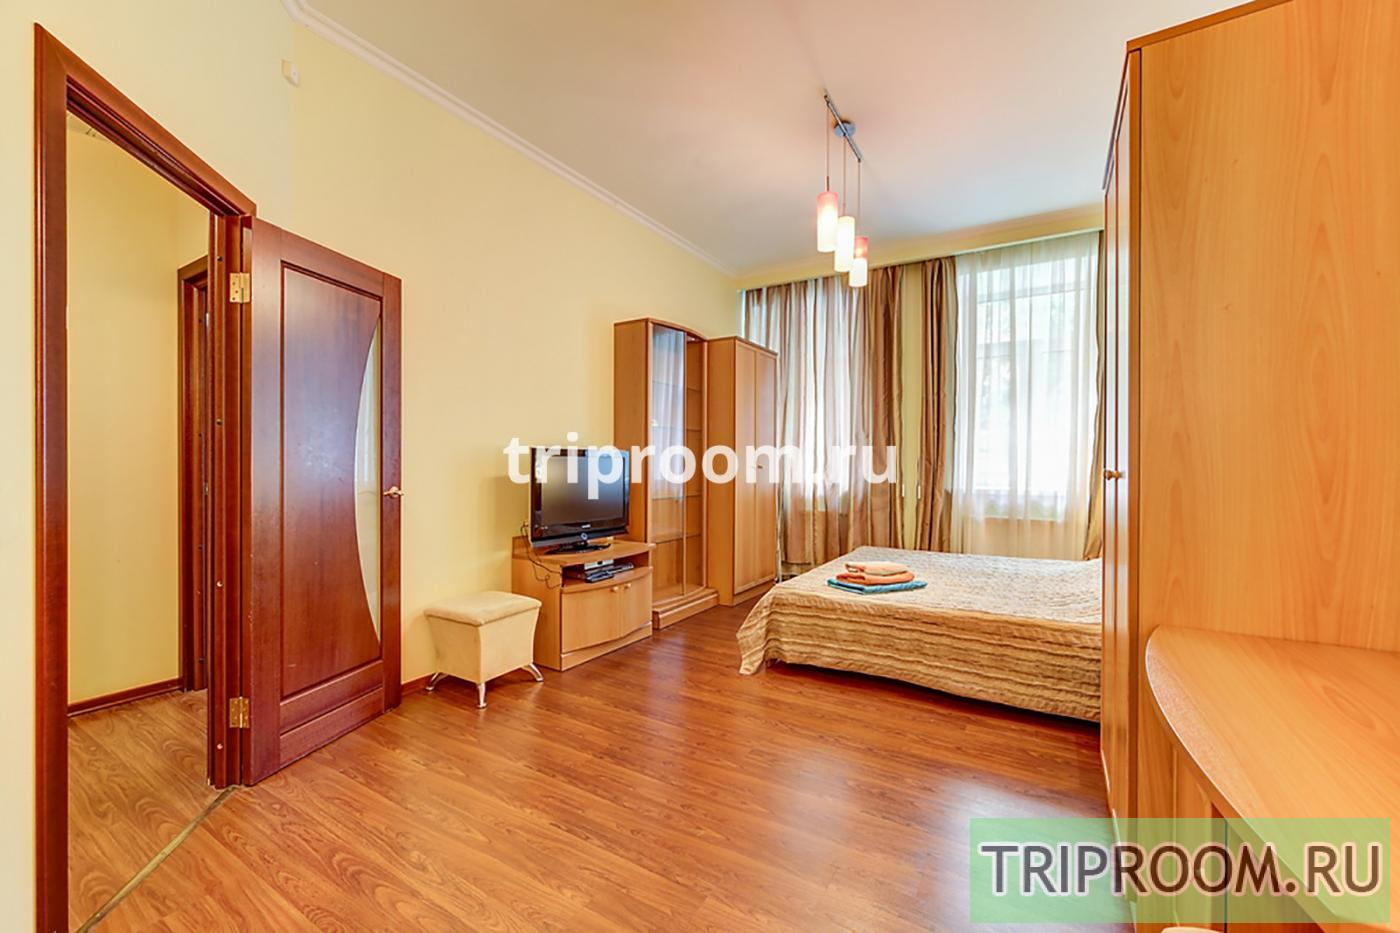 1-комнатная квартира посуточно (вариант № 15527), ул. Канала Грибоедова набережная, фото № 14